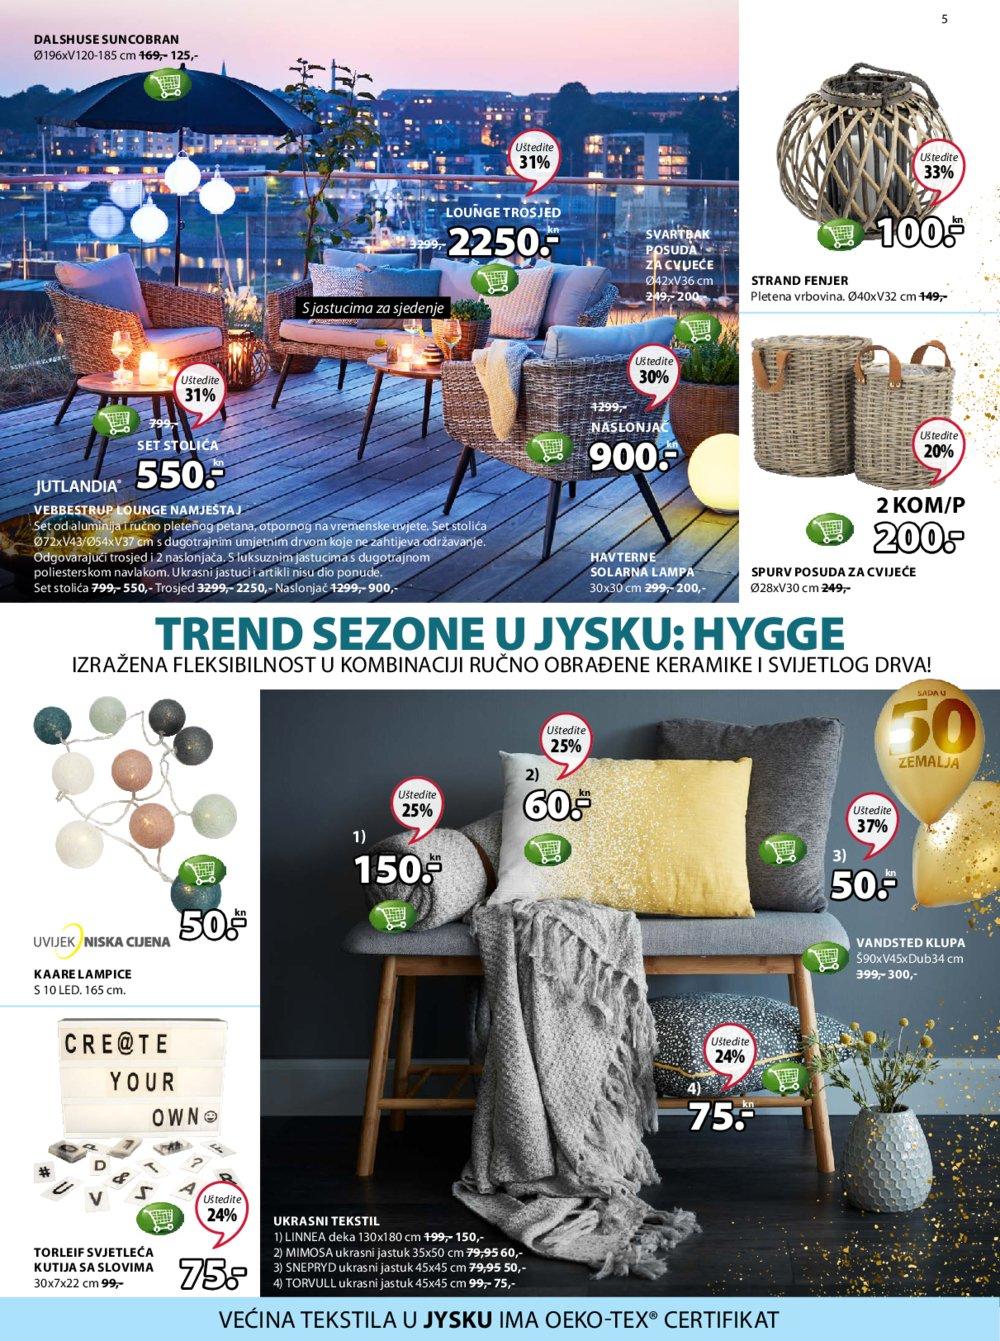 Jysk katalog Akcija 08.03.-21.03.2018.